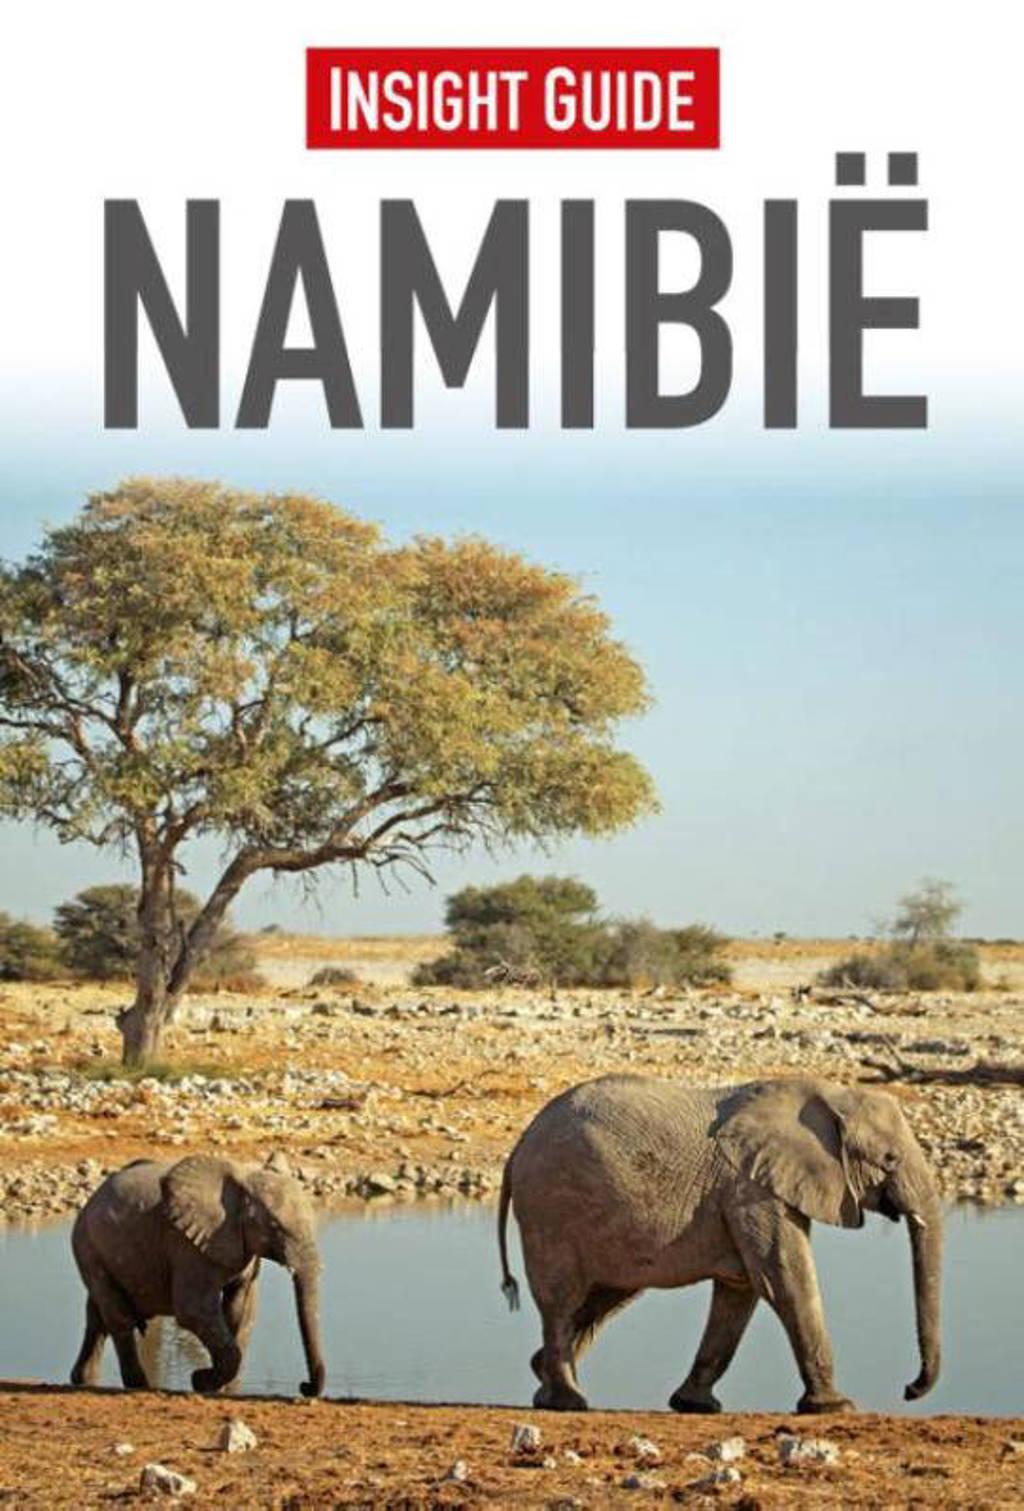 Insight guides: Namibië